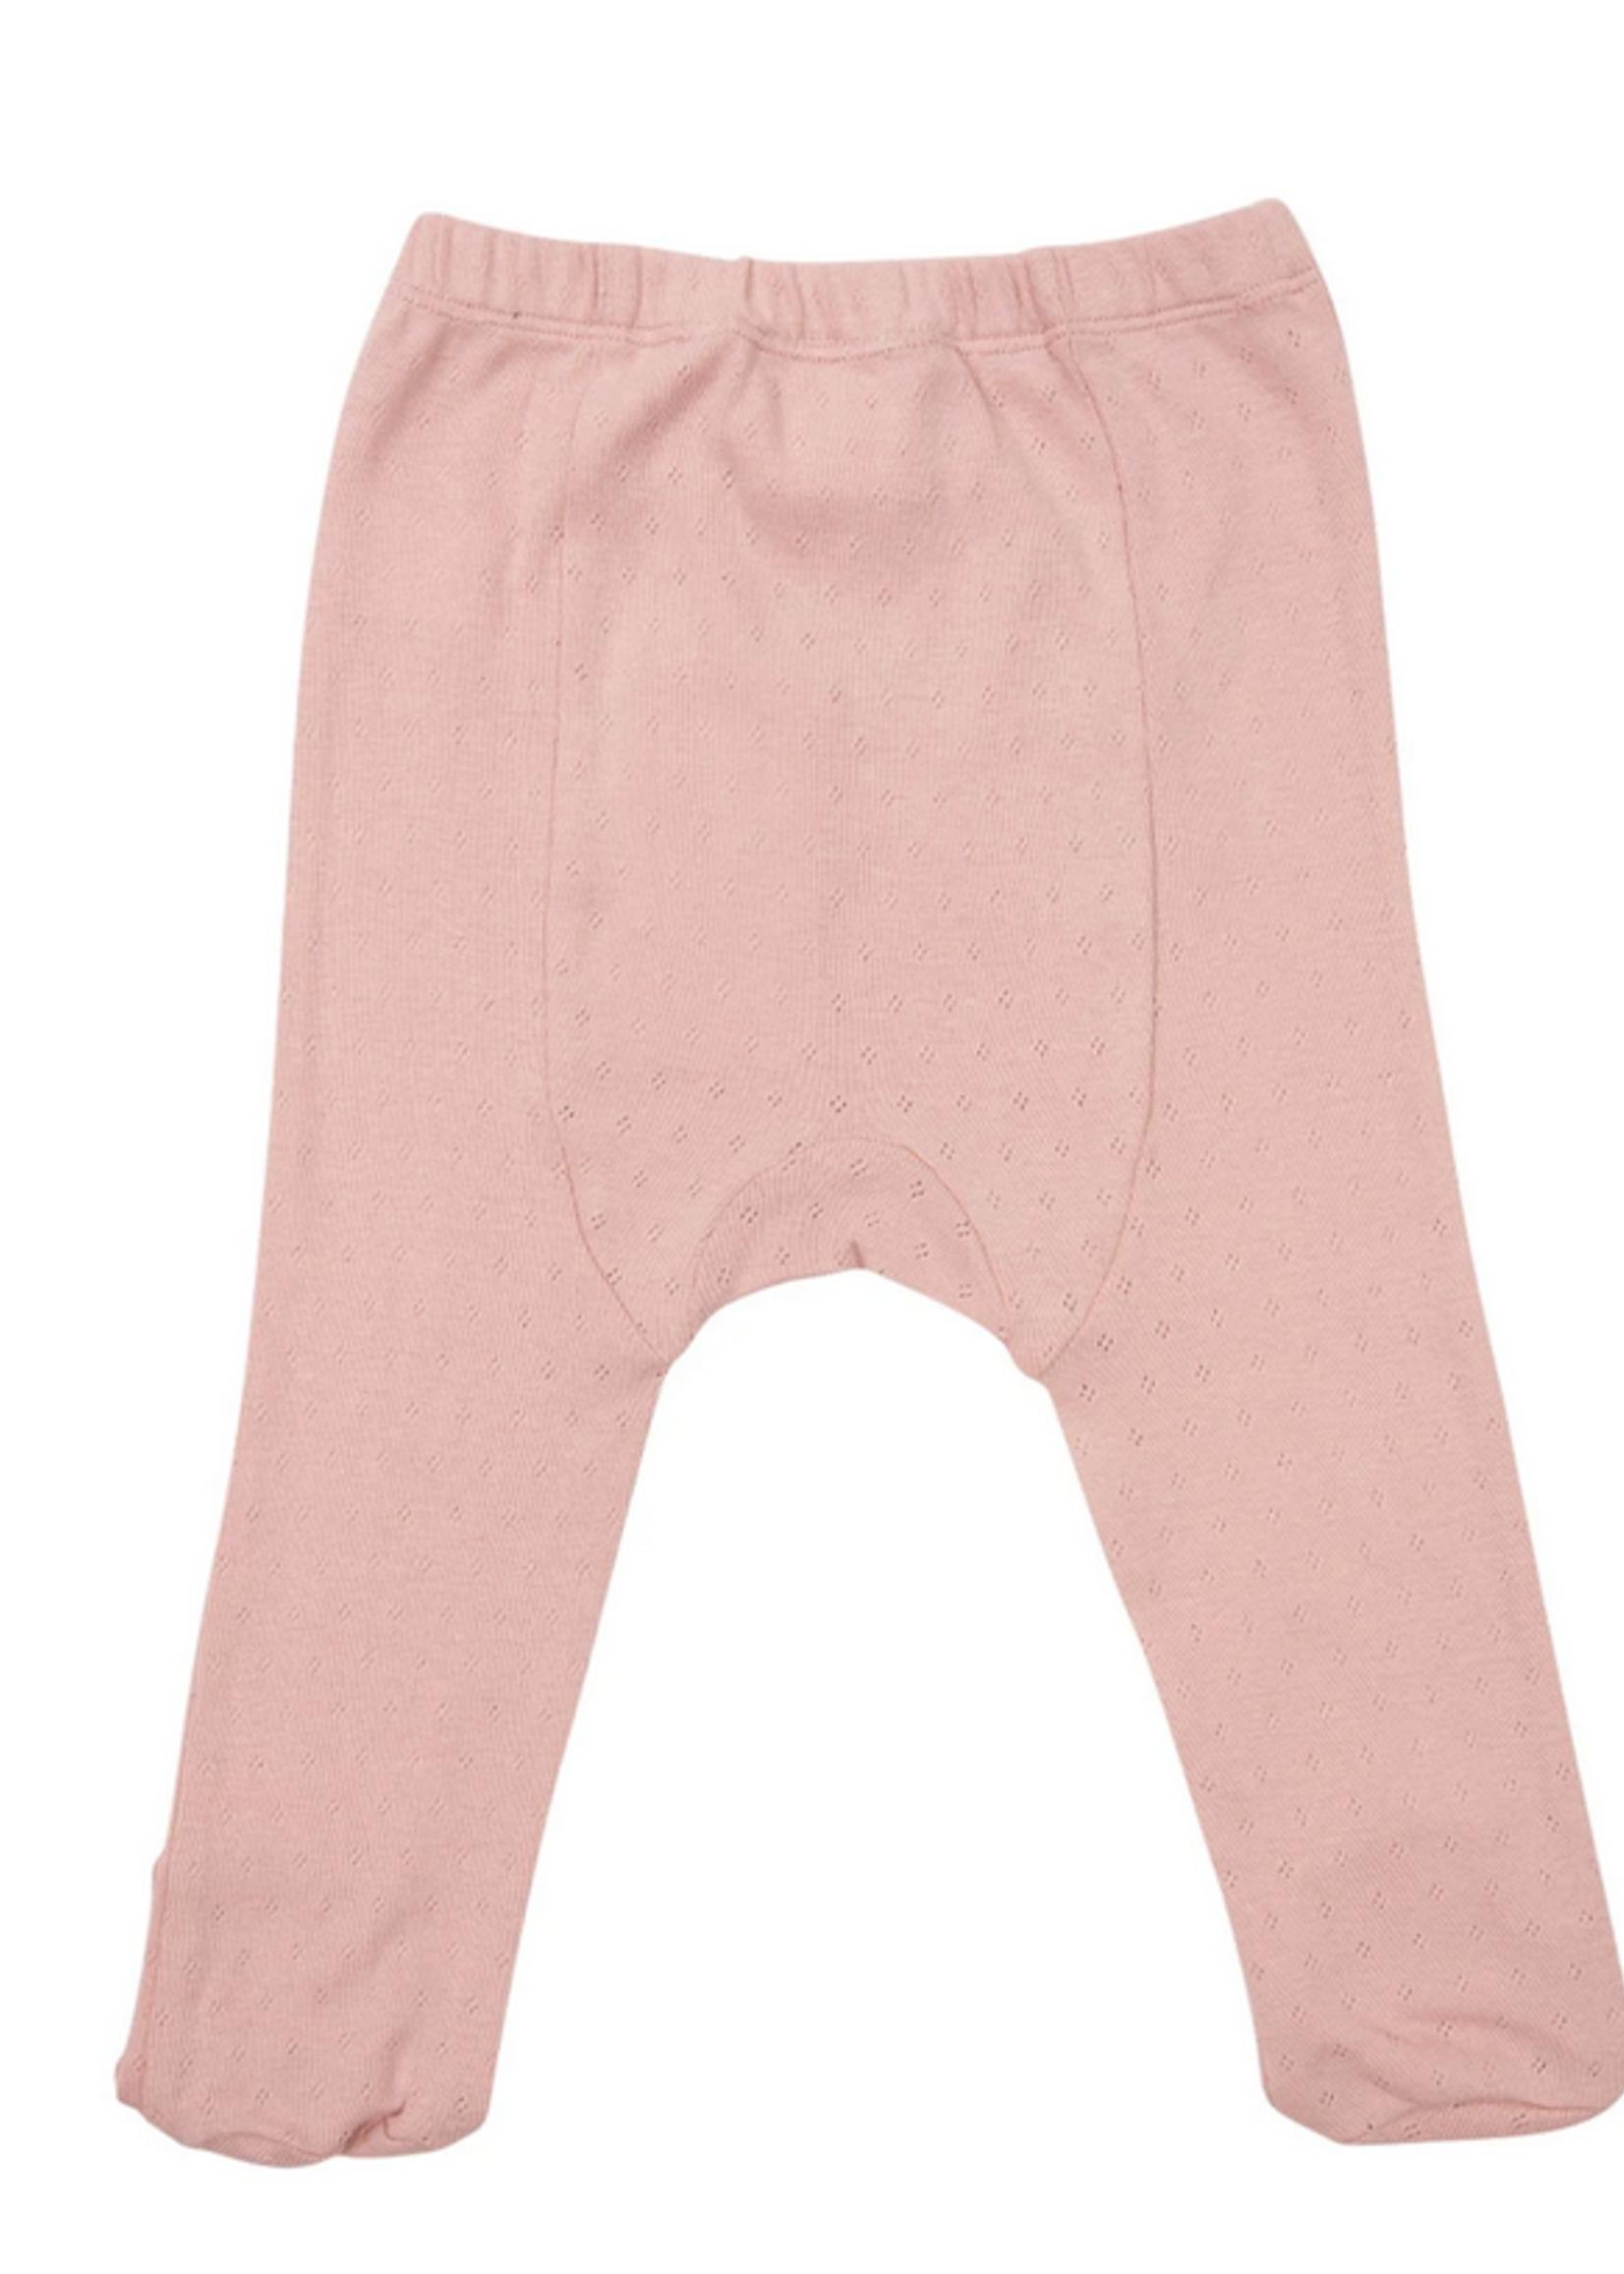 Elitaire Petite Organic Baby Legging in Pink